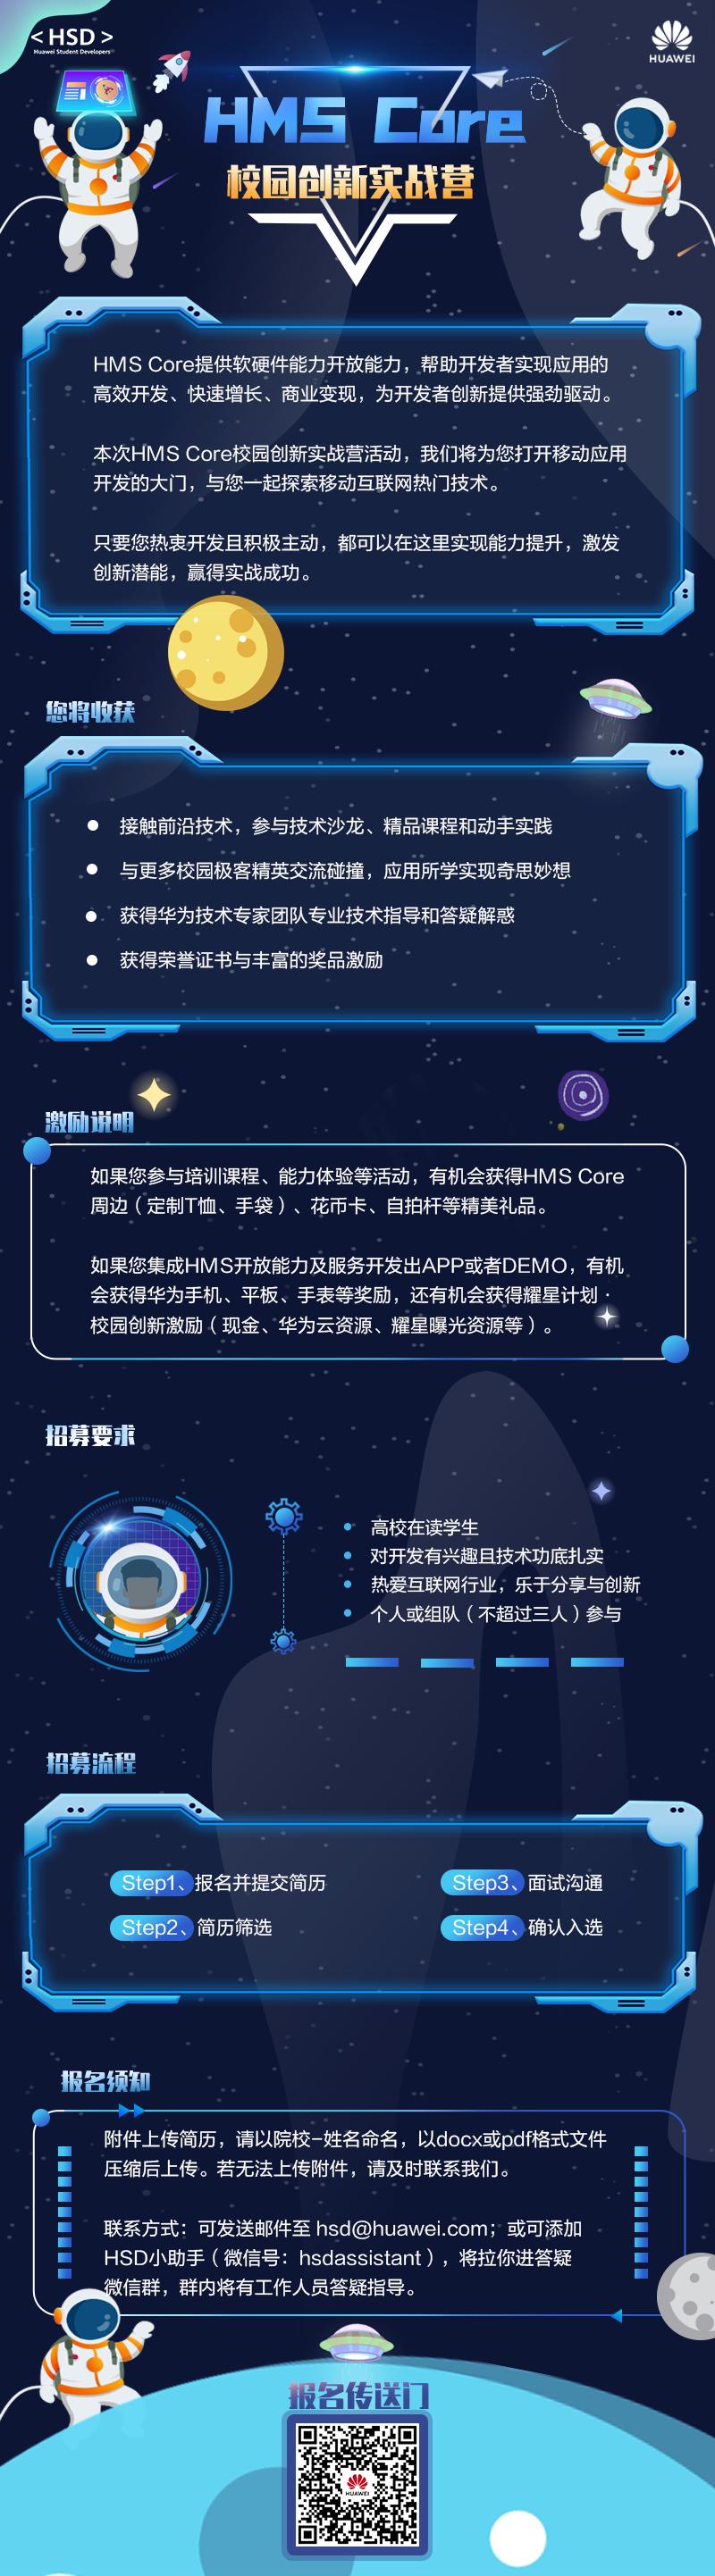 微信长图.png